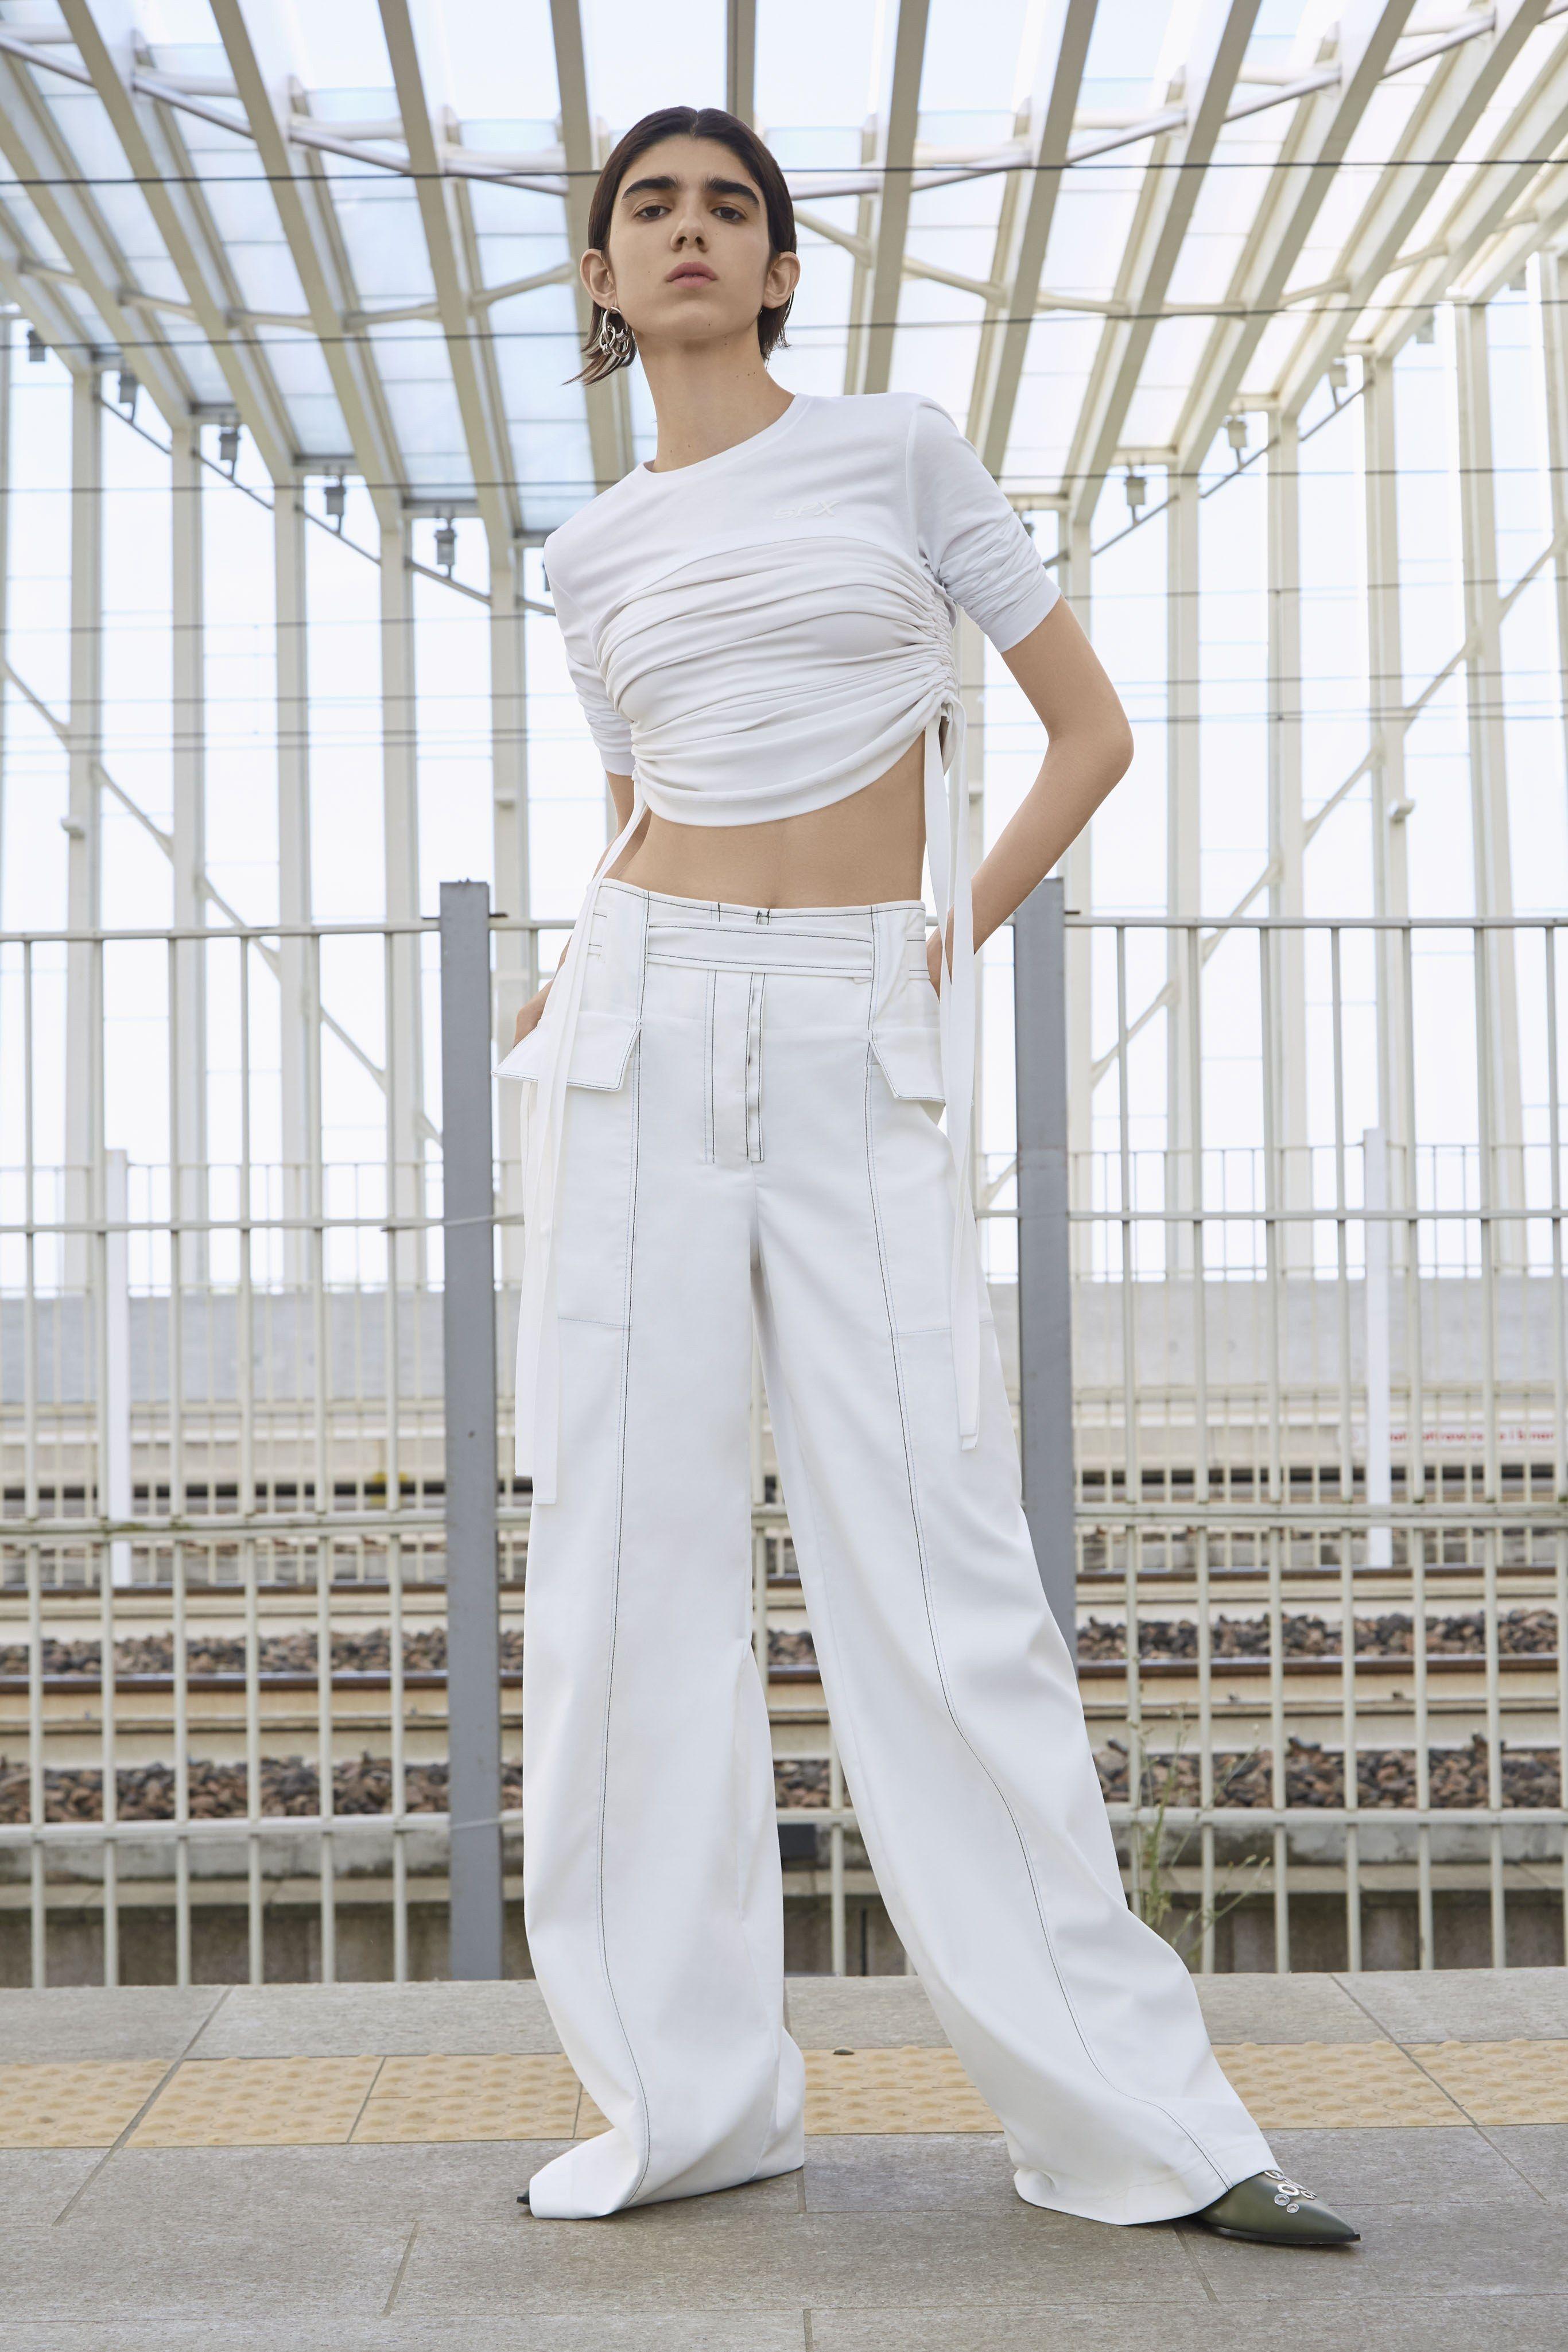 Sportmax Resort 2019 Milan Collection - Vogue Faldas 92141e83c